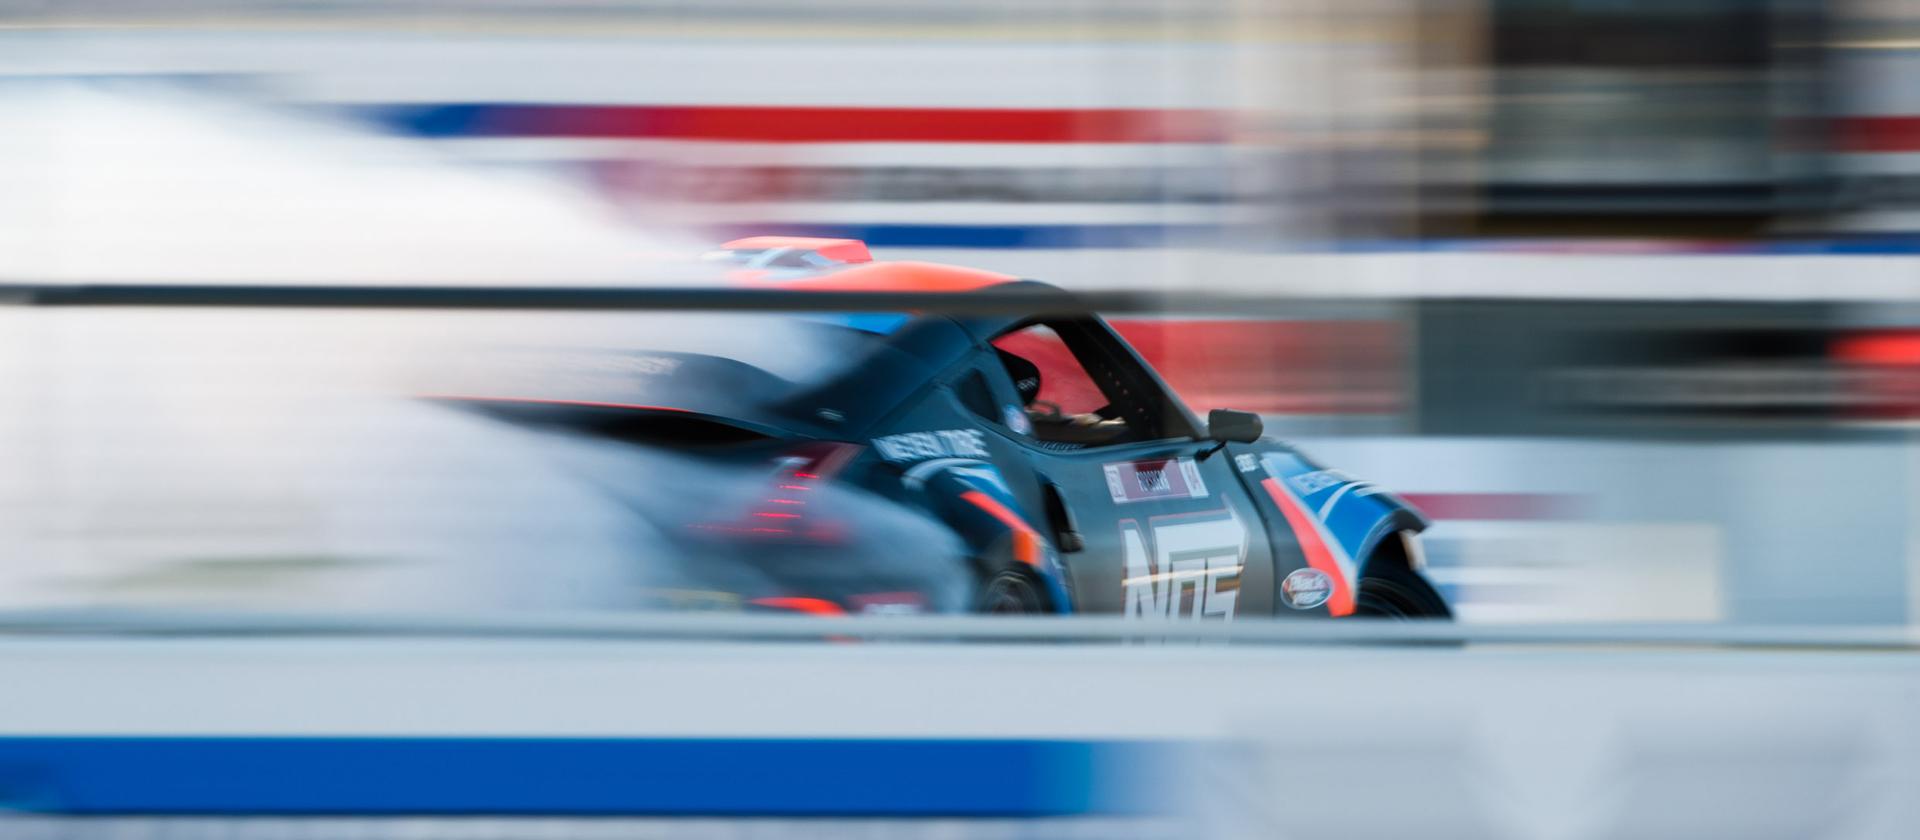 bc-racing-na-chris-forsberg-1506